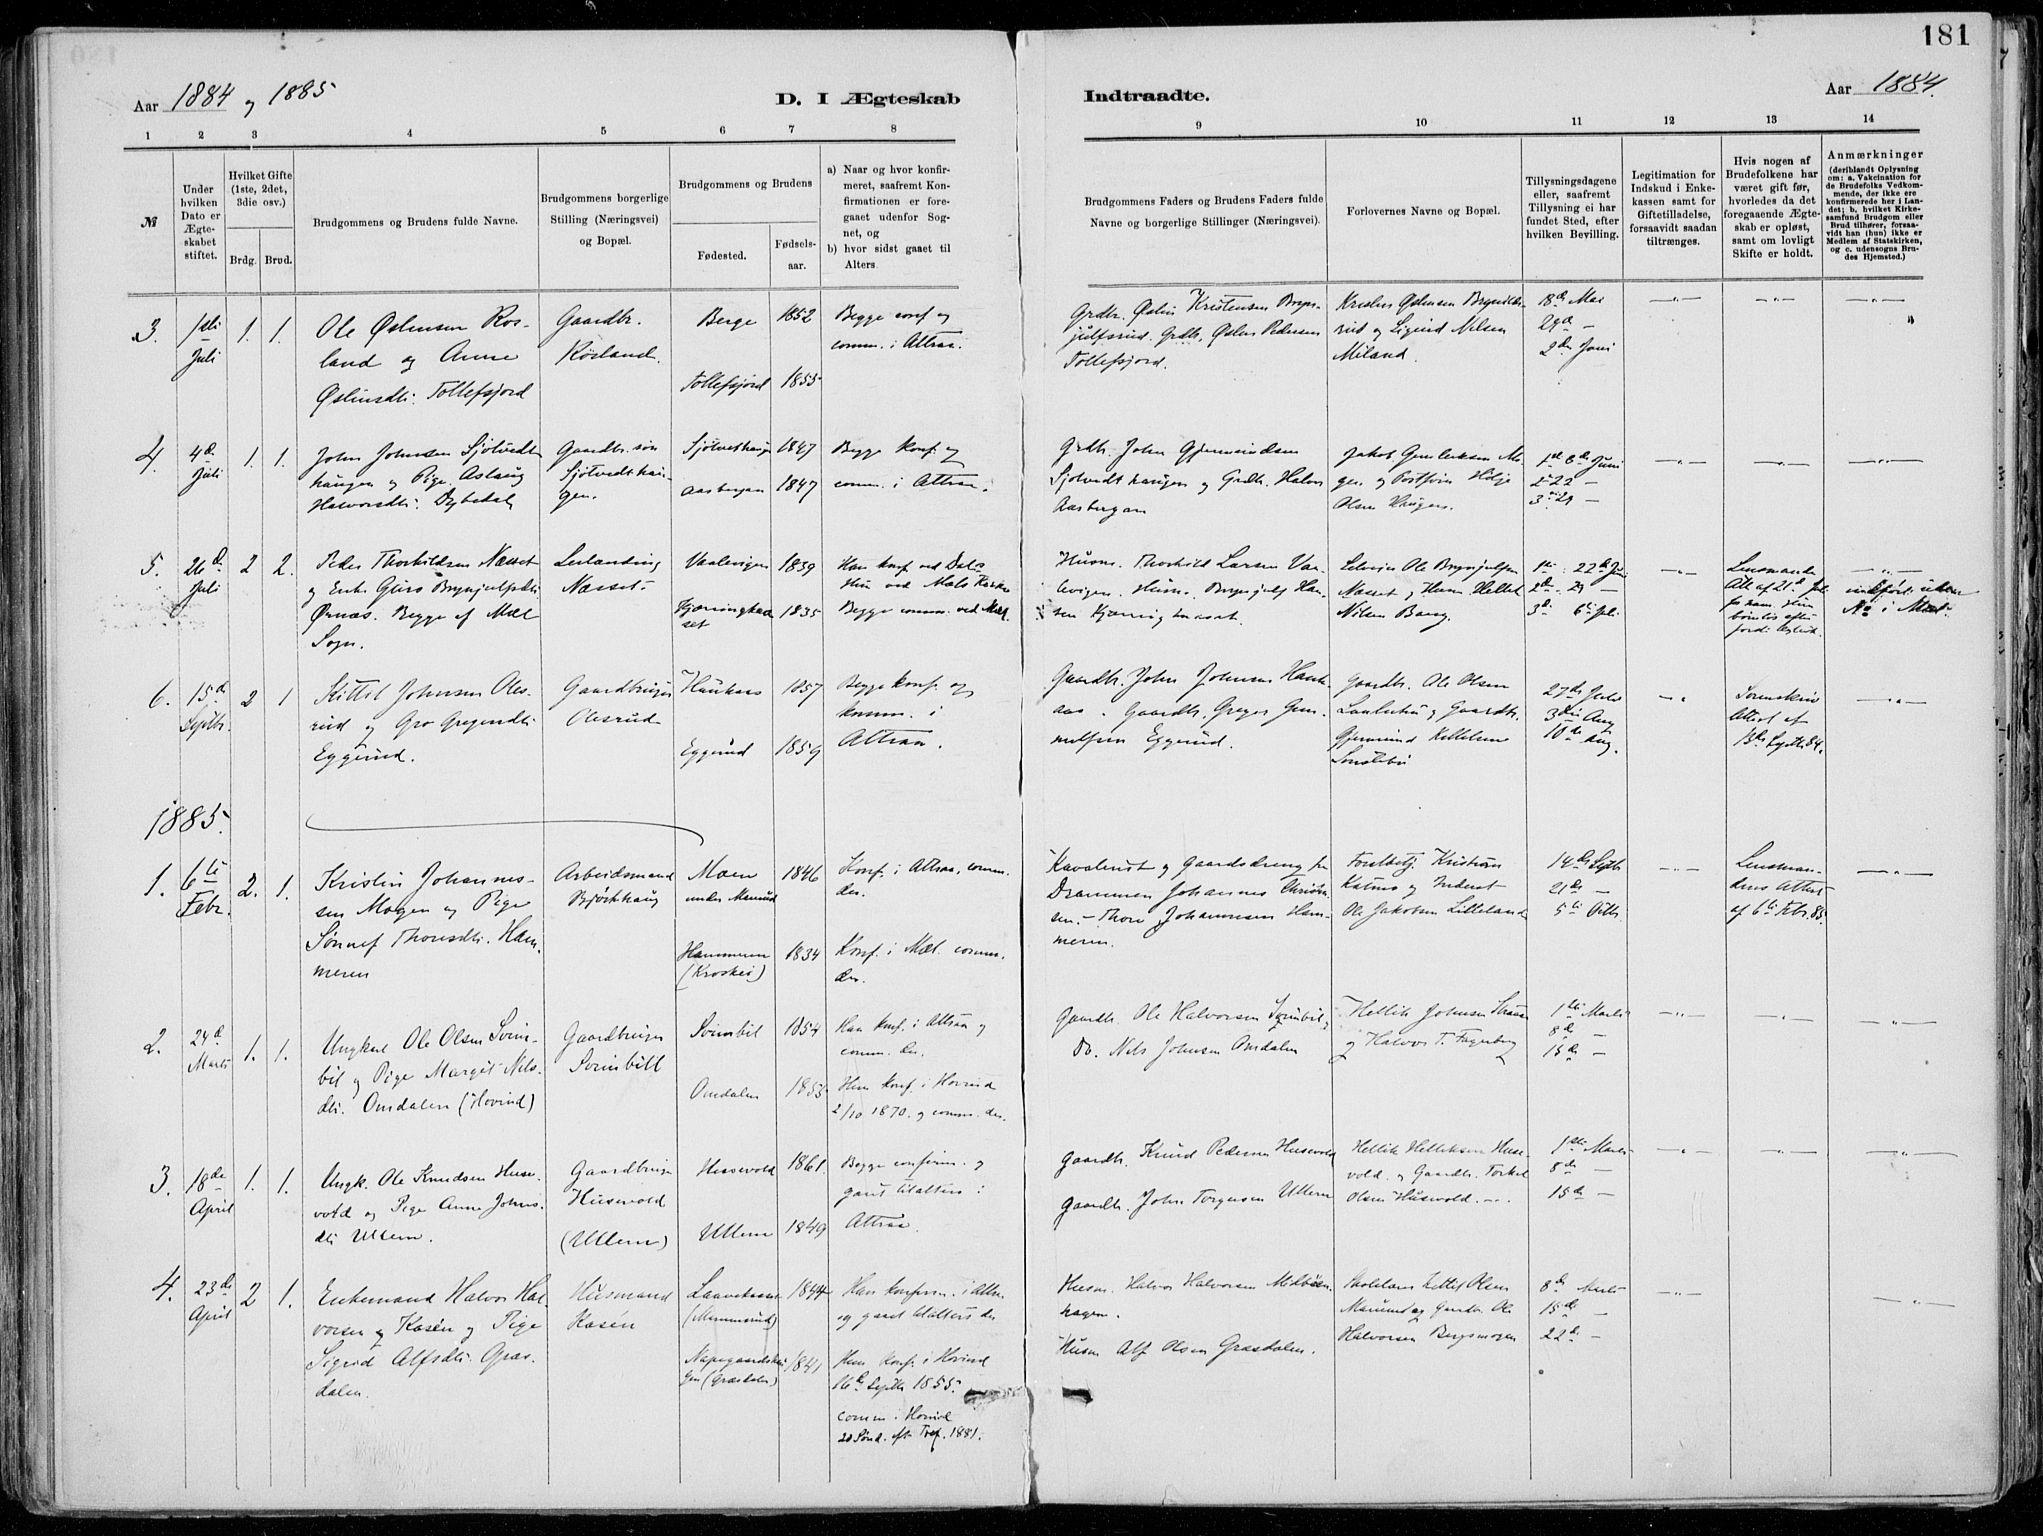 SAKO, Tinn kirkebøker, F/Fa/L0007: Ministerialbok nr. I 7, 1878-1922, s. 181